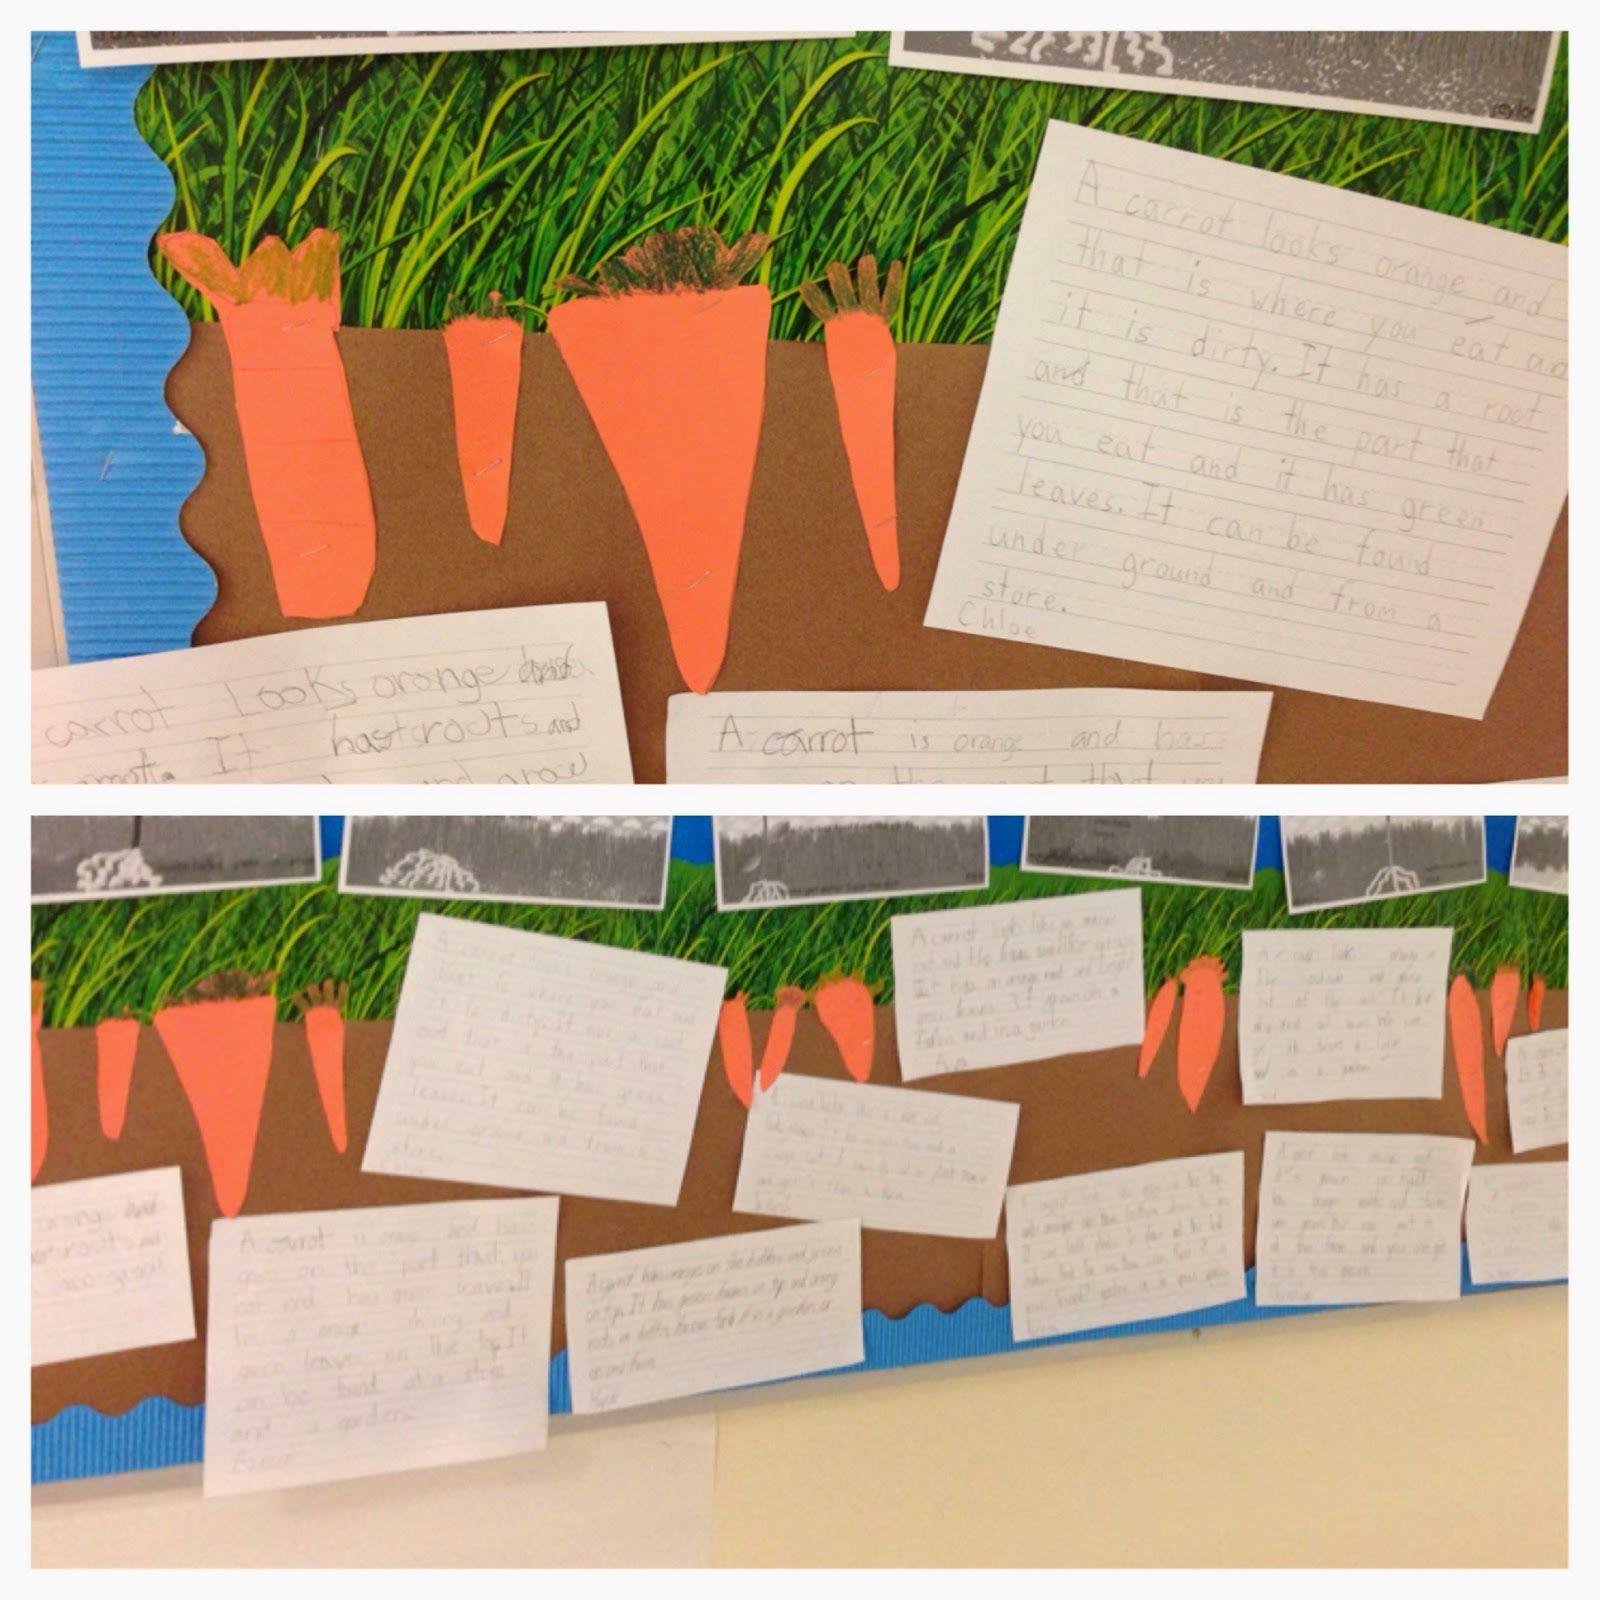 Bishop's Blackboard: A First Grade Blog - Carrot Descriptive Writing